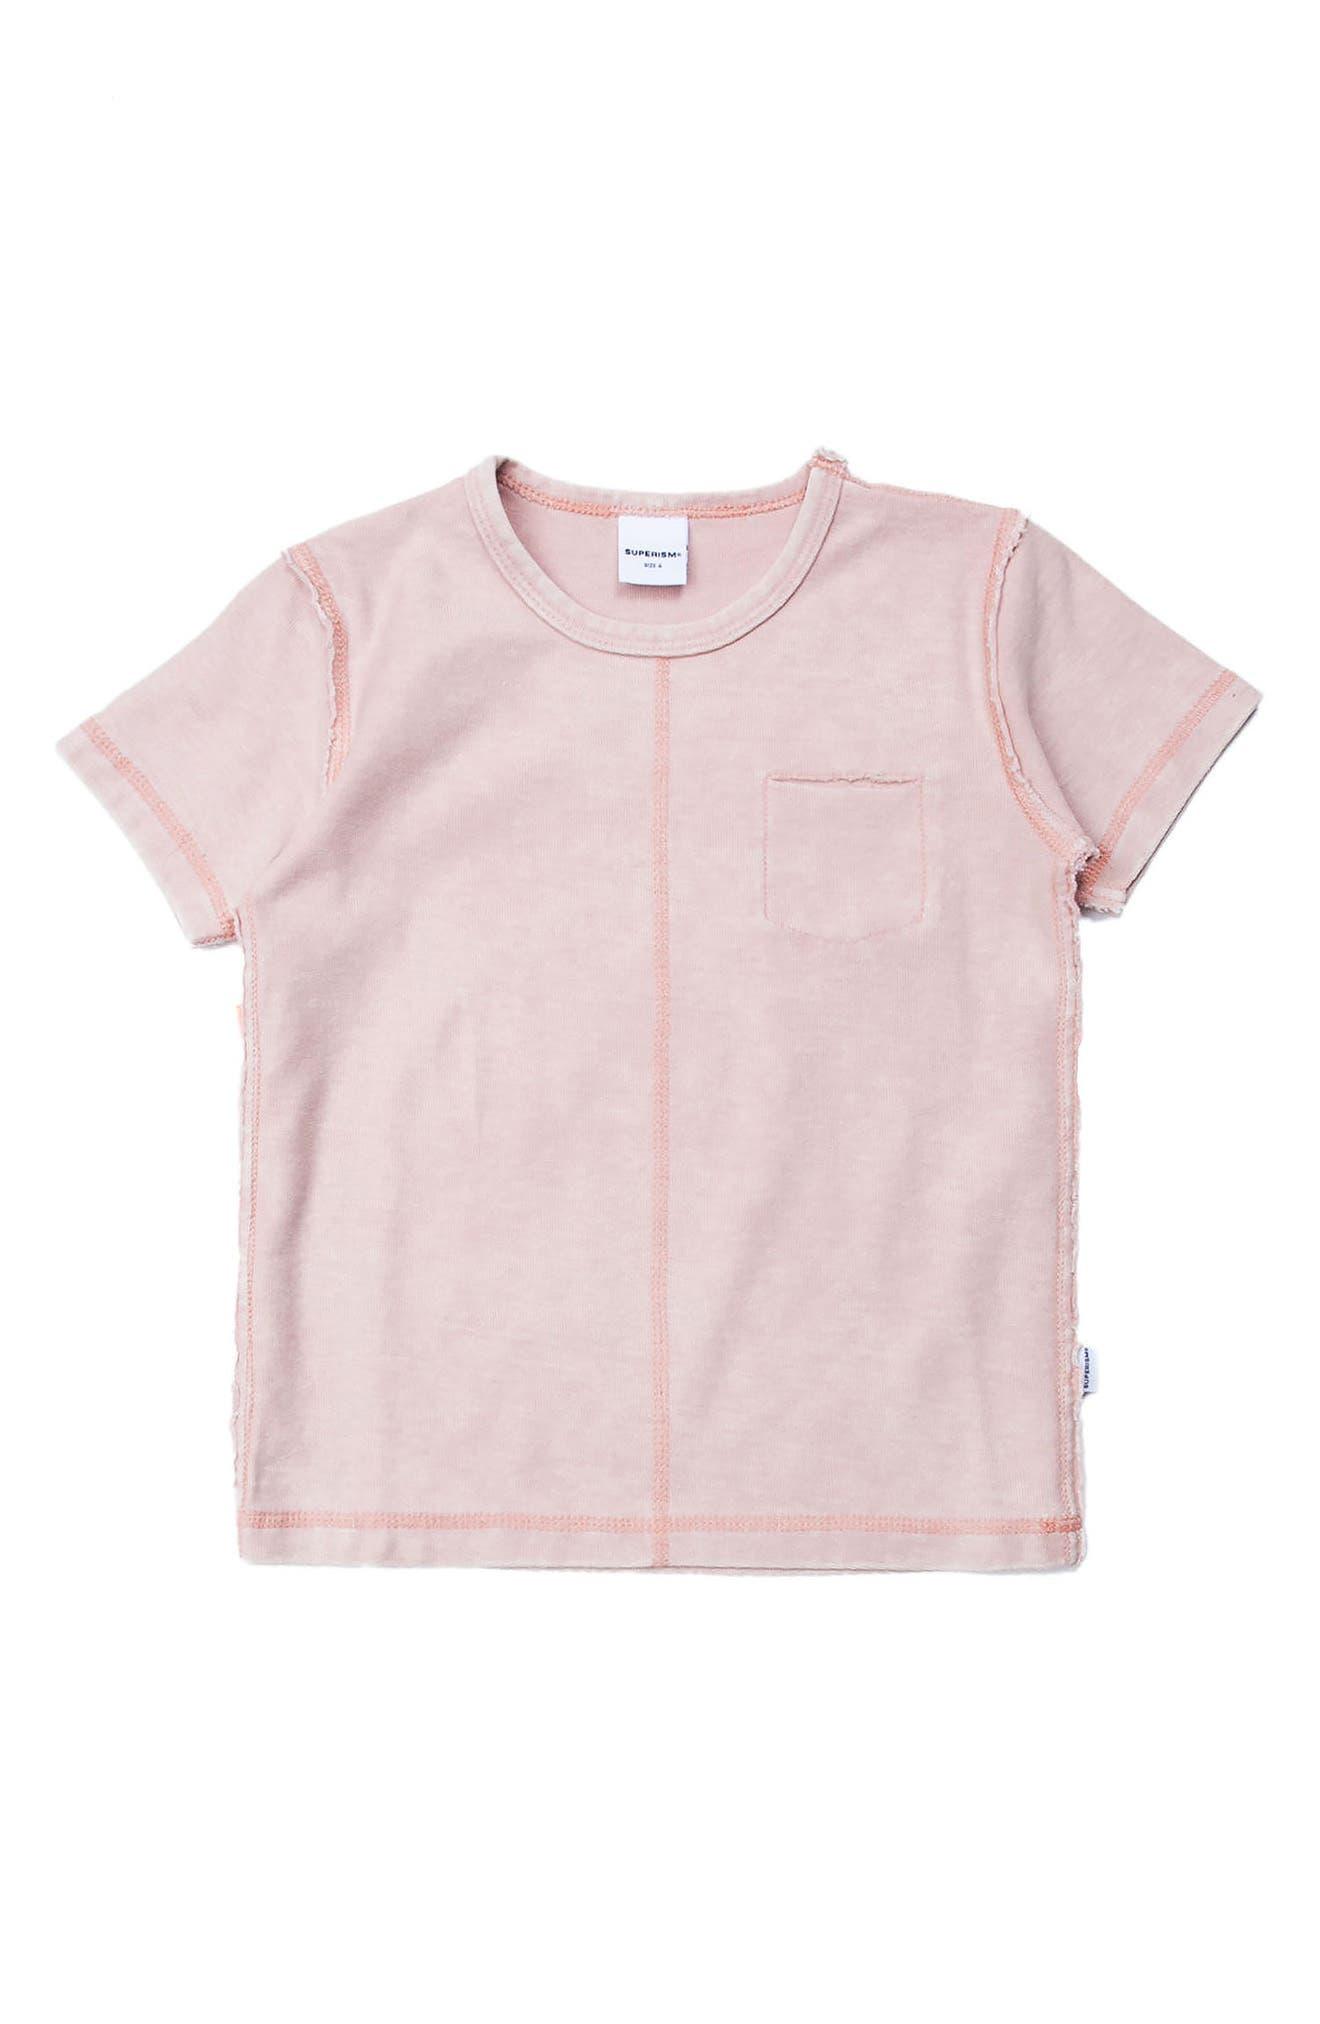 Emery Pocket T-Shirt,                             Main thumbnail 1, color,                             650